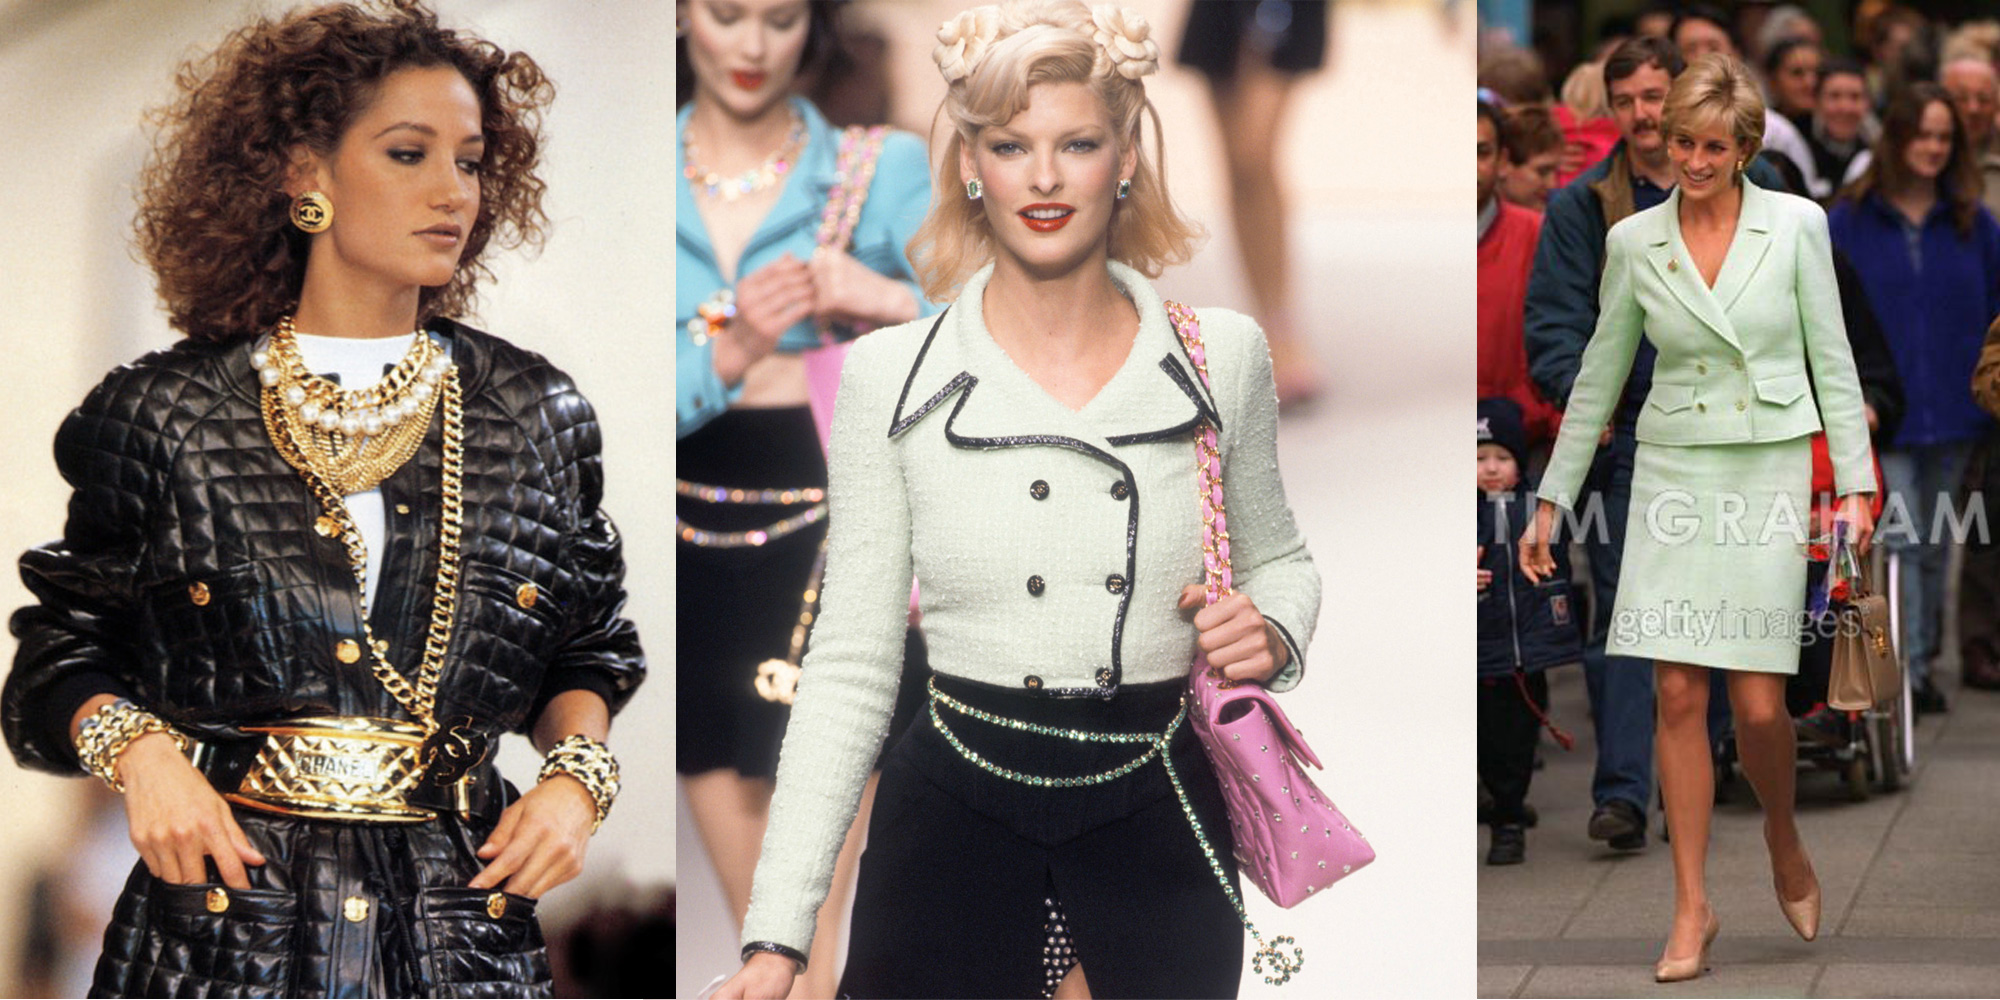 Grunge fashion 1990s men 1990s grunge fashion related keywords - Filename Chanel_1991runway_1995runway_princessdiana1997 Jpg